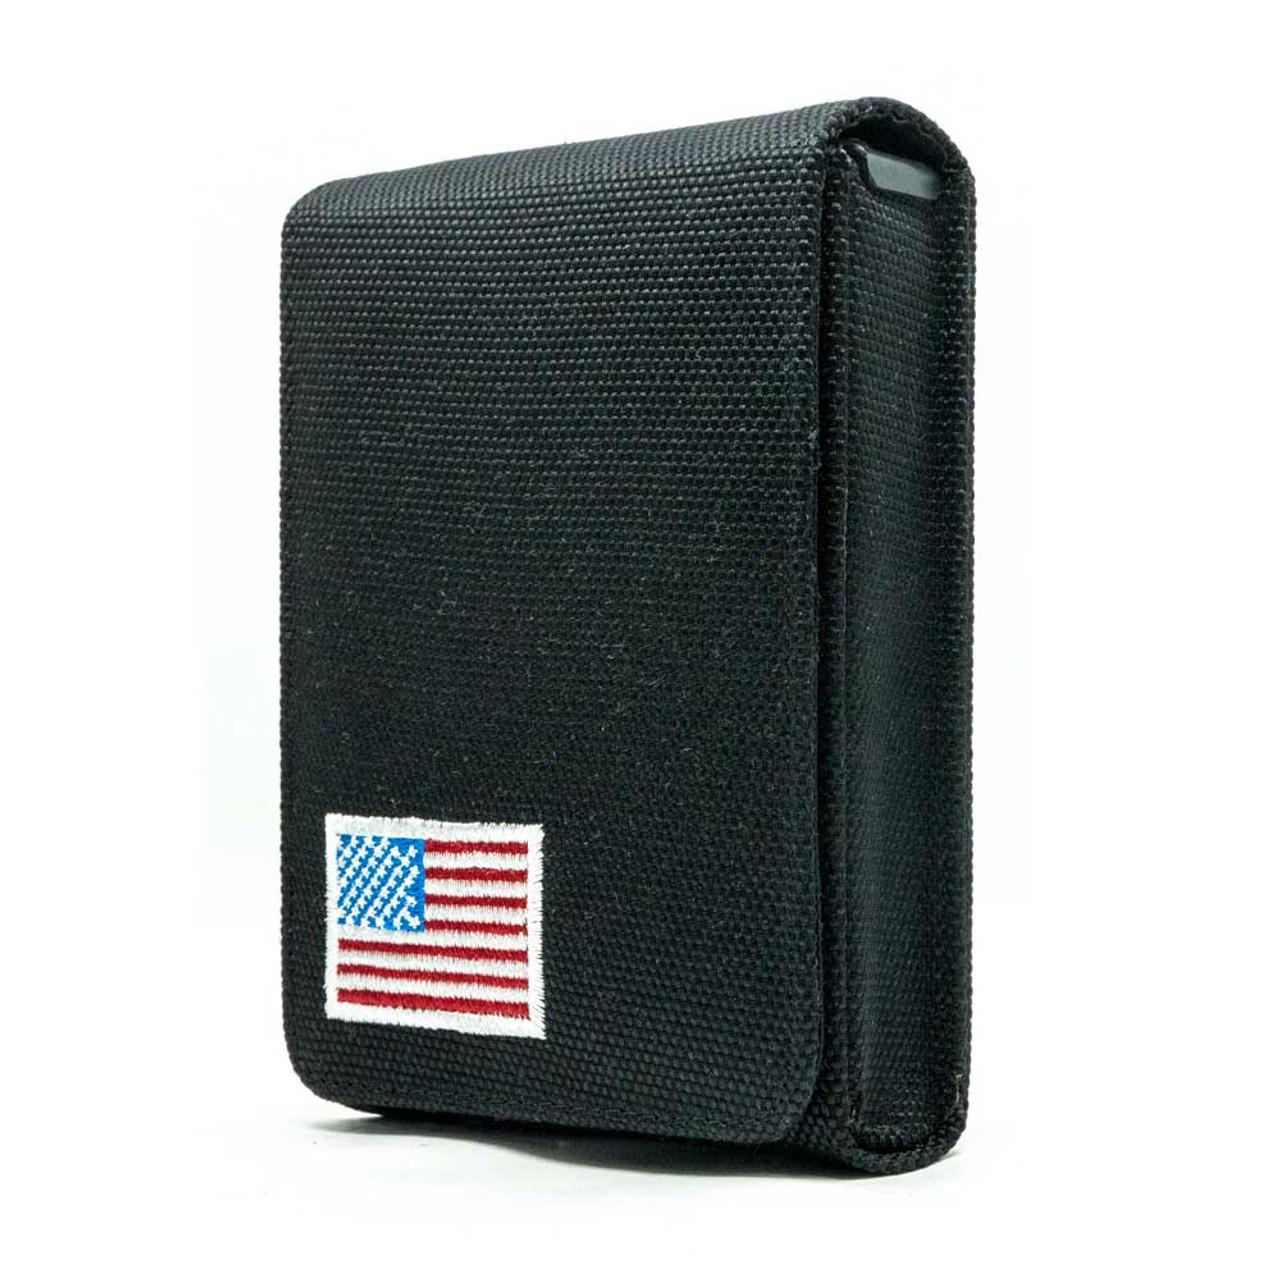 Taurus G2S Black Canvas Flag Series Holster